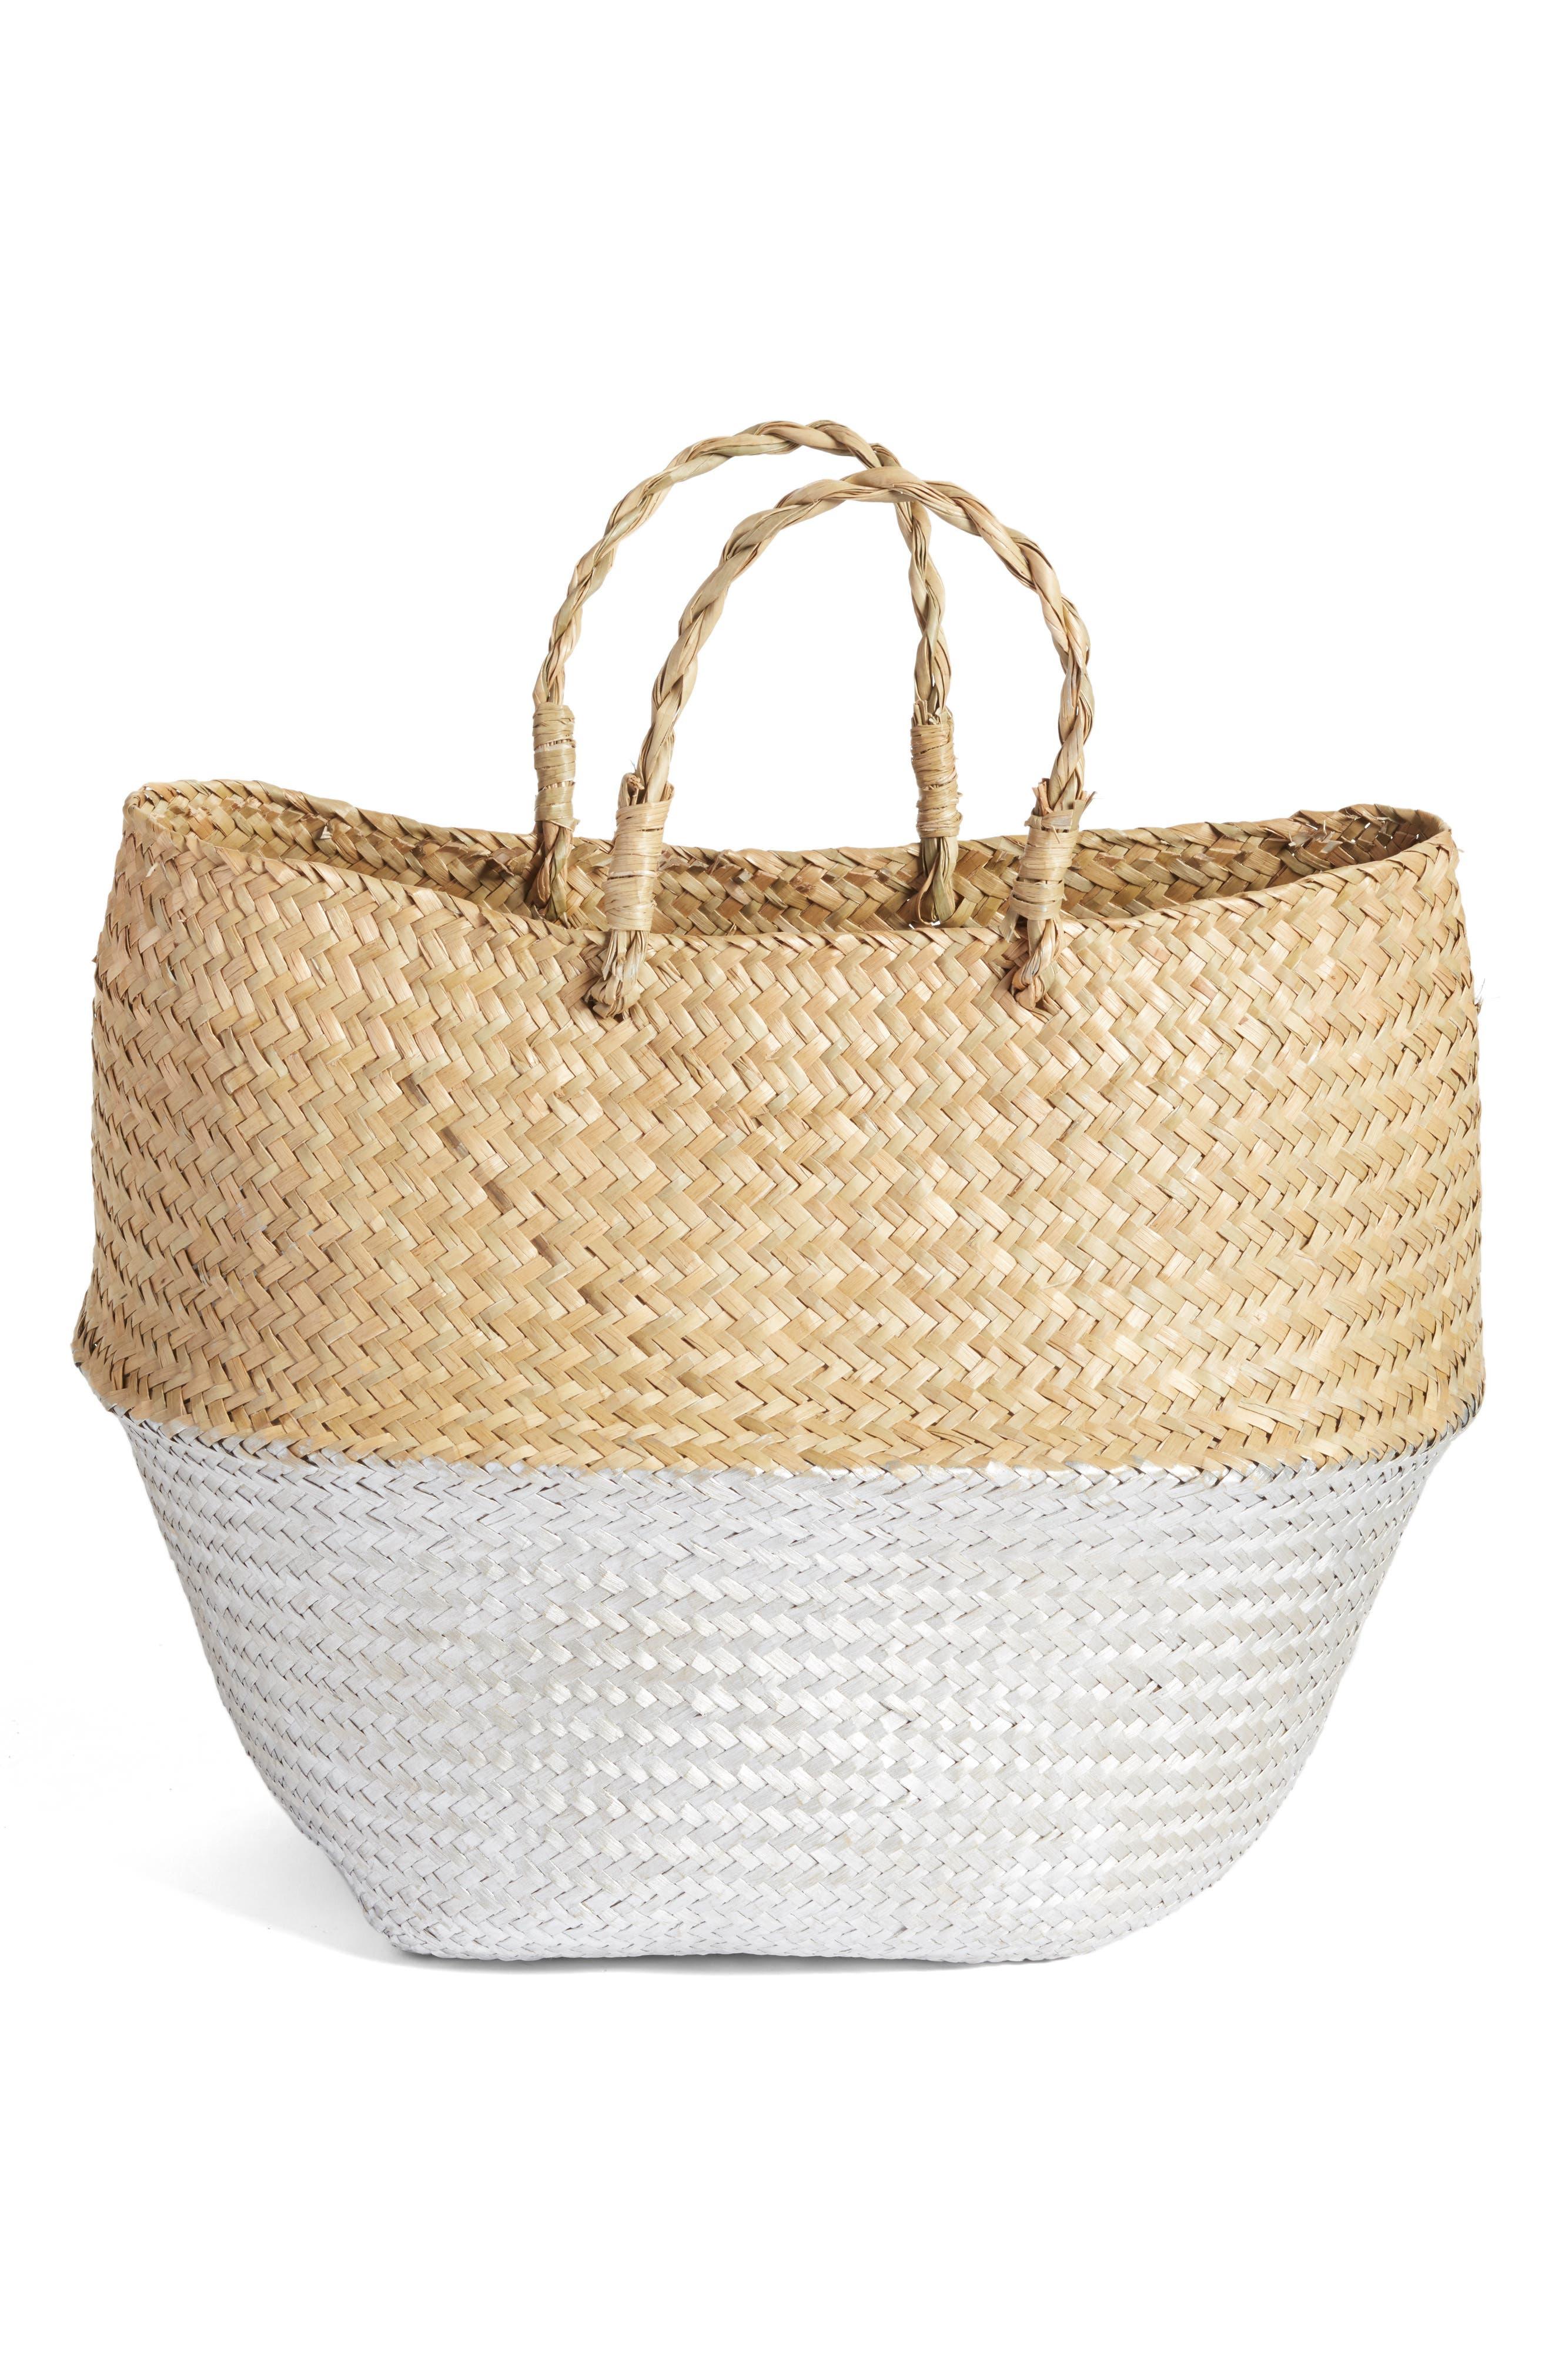 Two-Tone Metallic Straw Basket,                             Main thumbnail 1, color,                             Metallic Silver